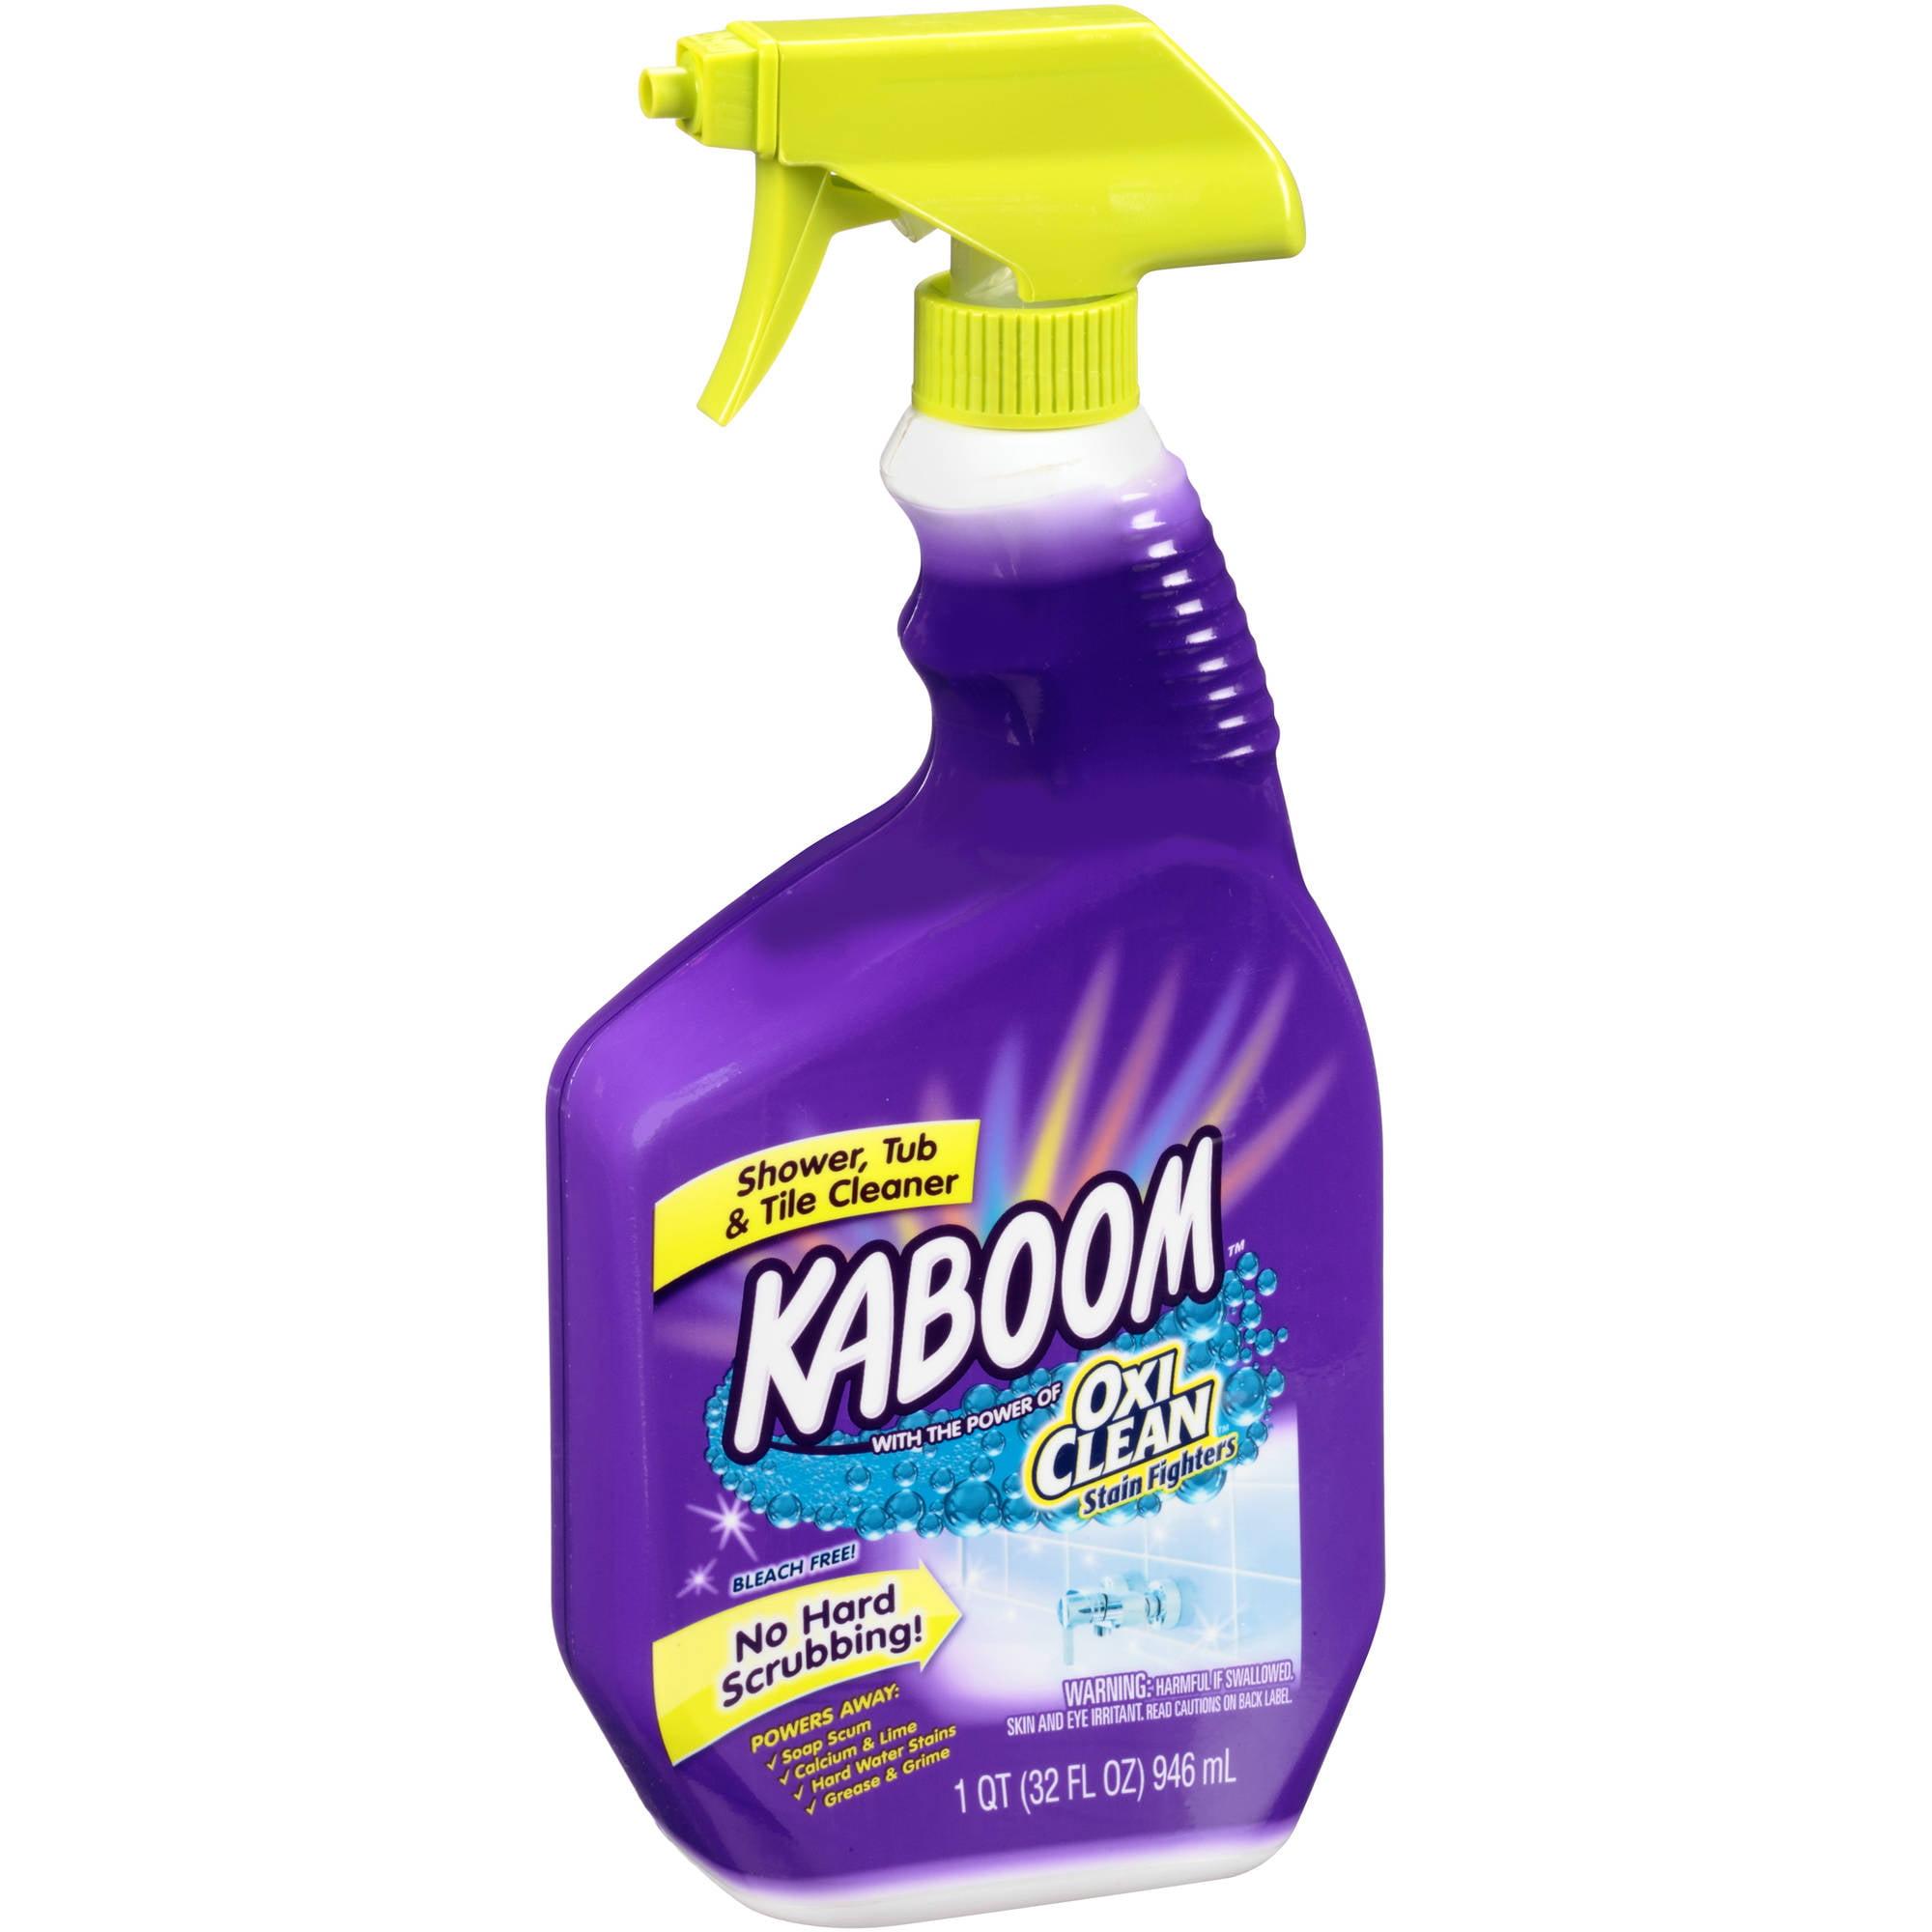 kaboom shower tub tile bathroom cleaner - Cleaning Bathroom Tile